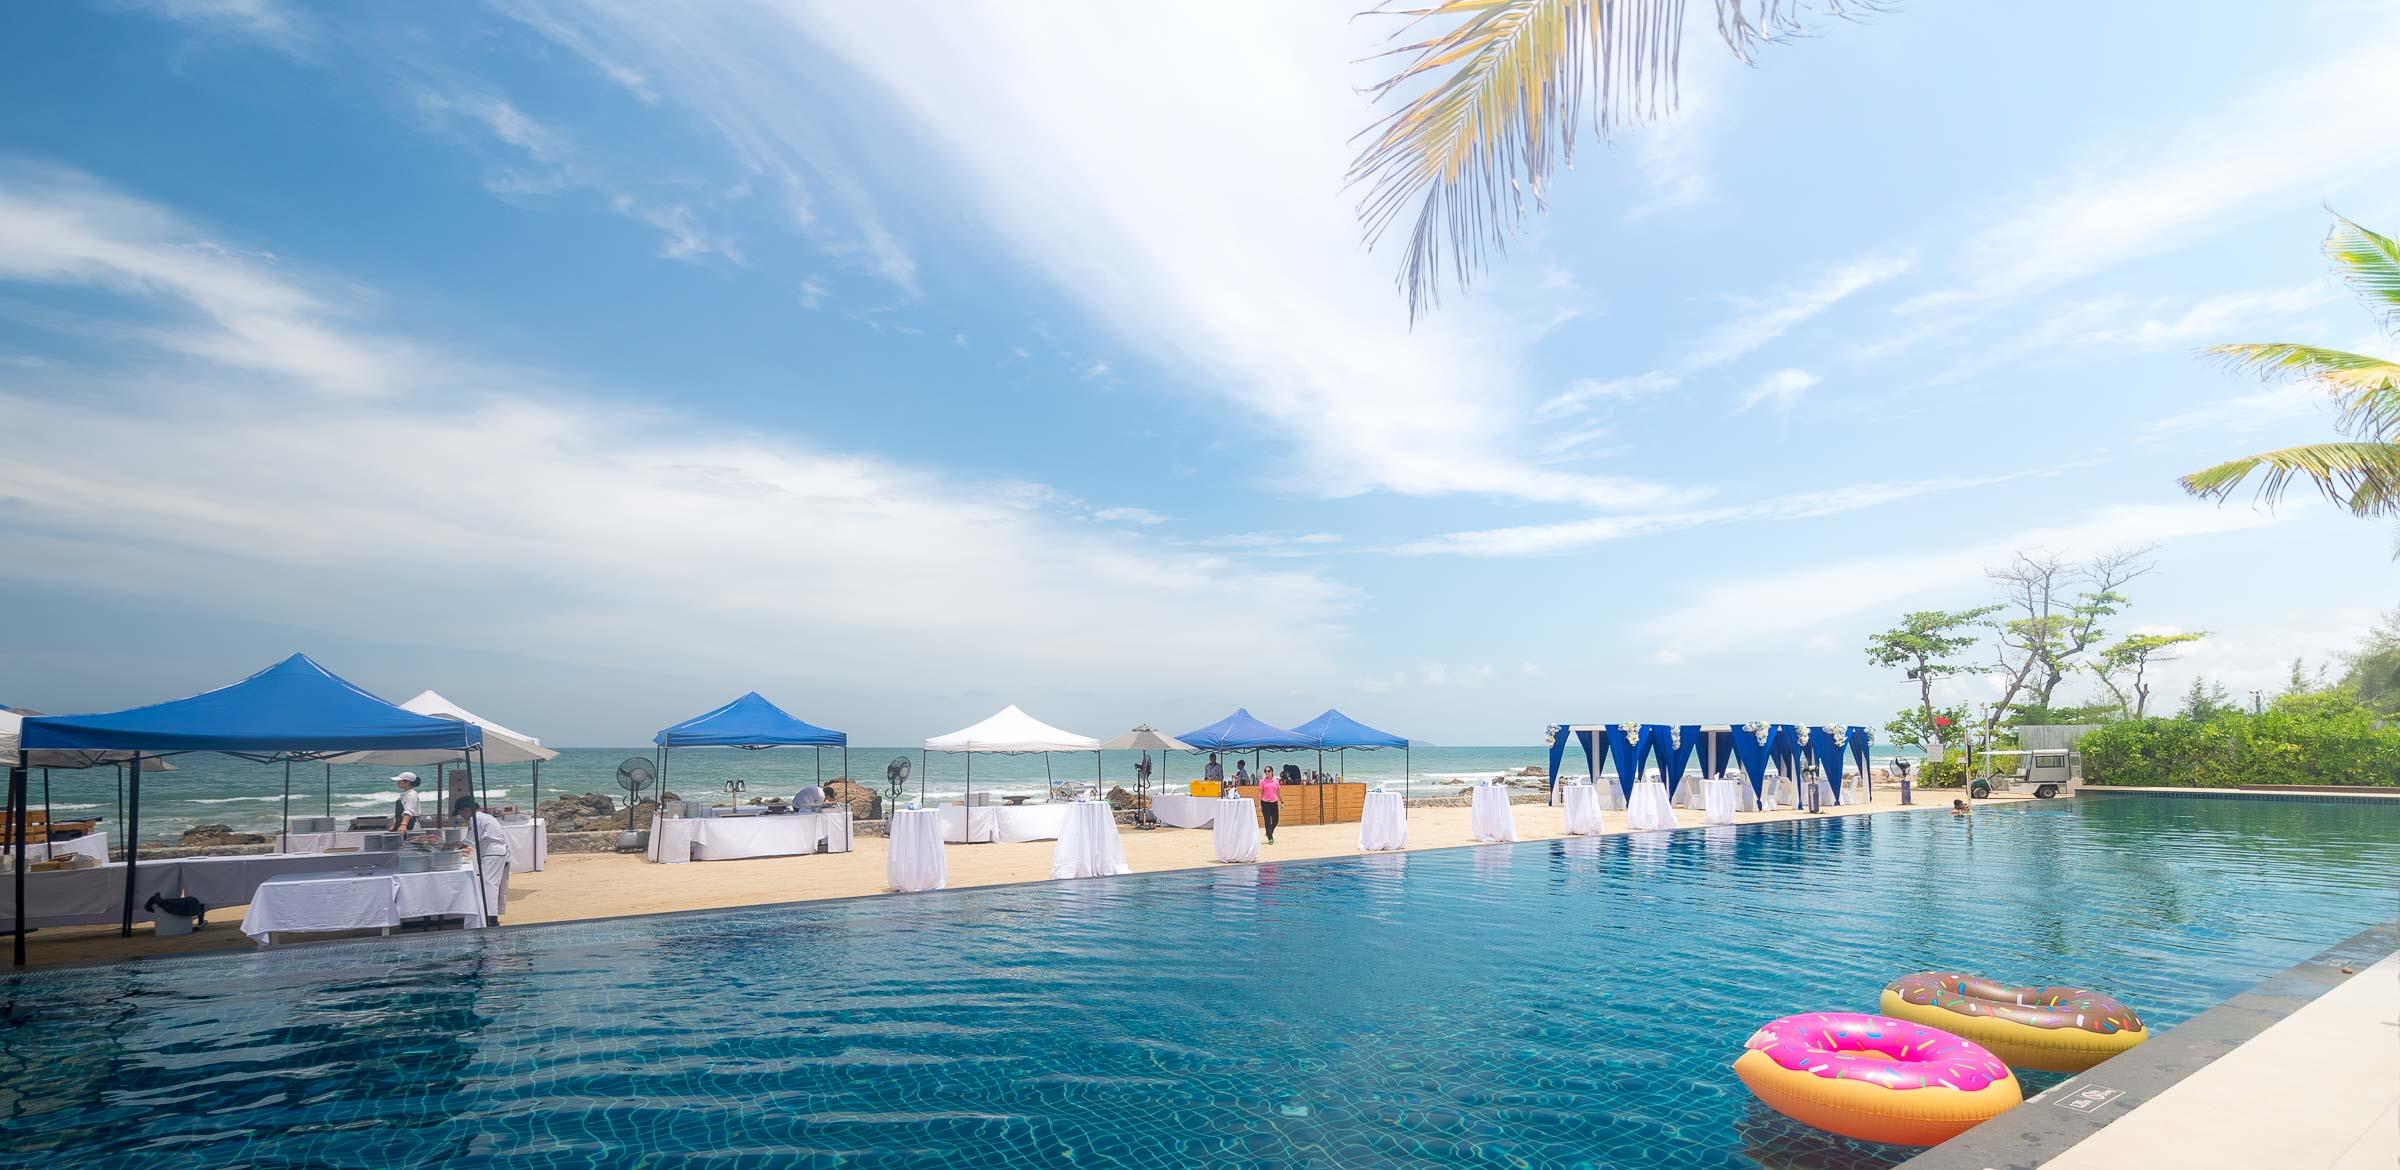 thailand-wedding-photographer-marriott-spa-resort-rayong-indian-wedding-photography-bangkok-pool-party-003